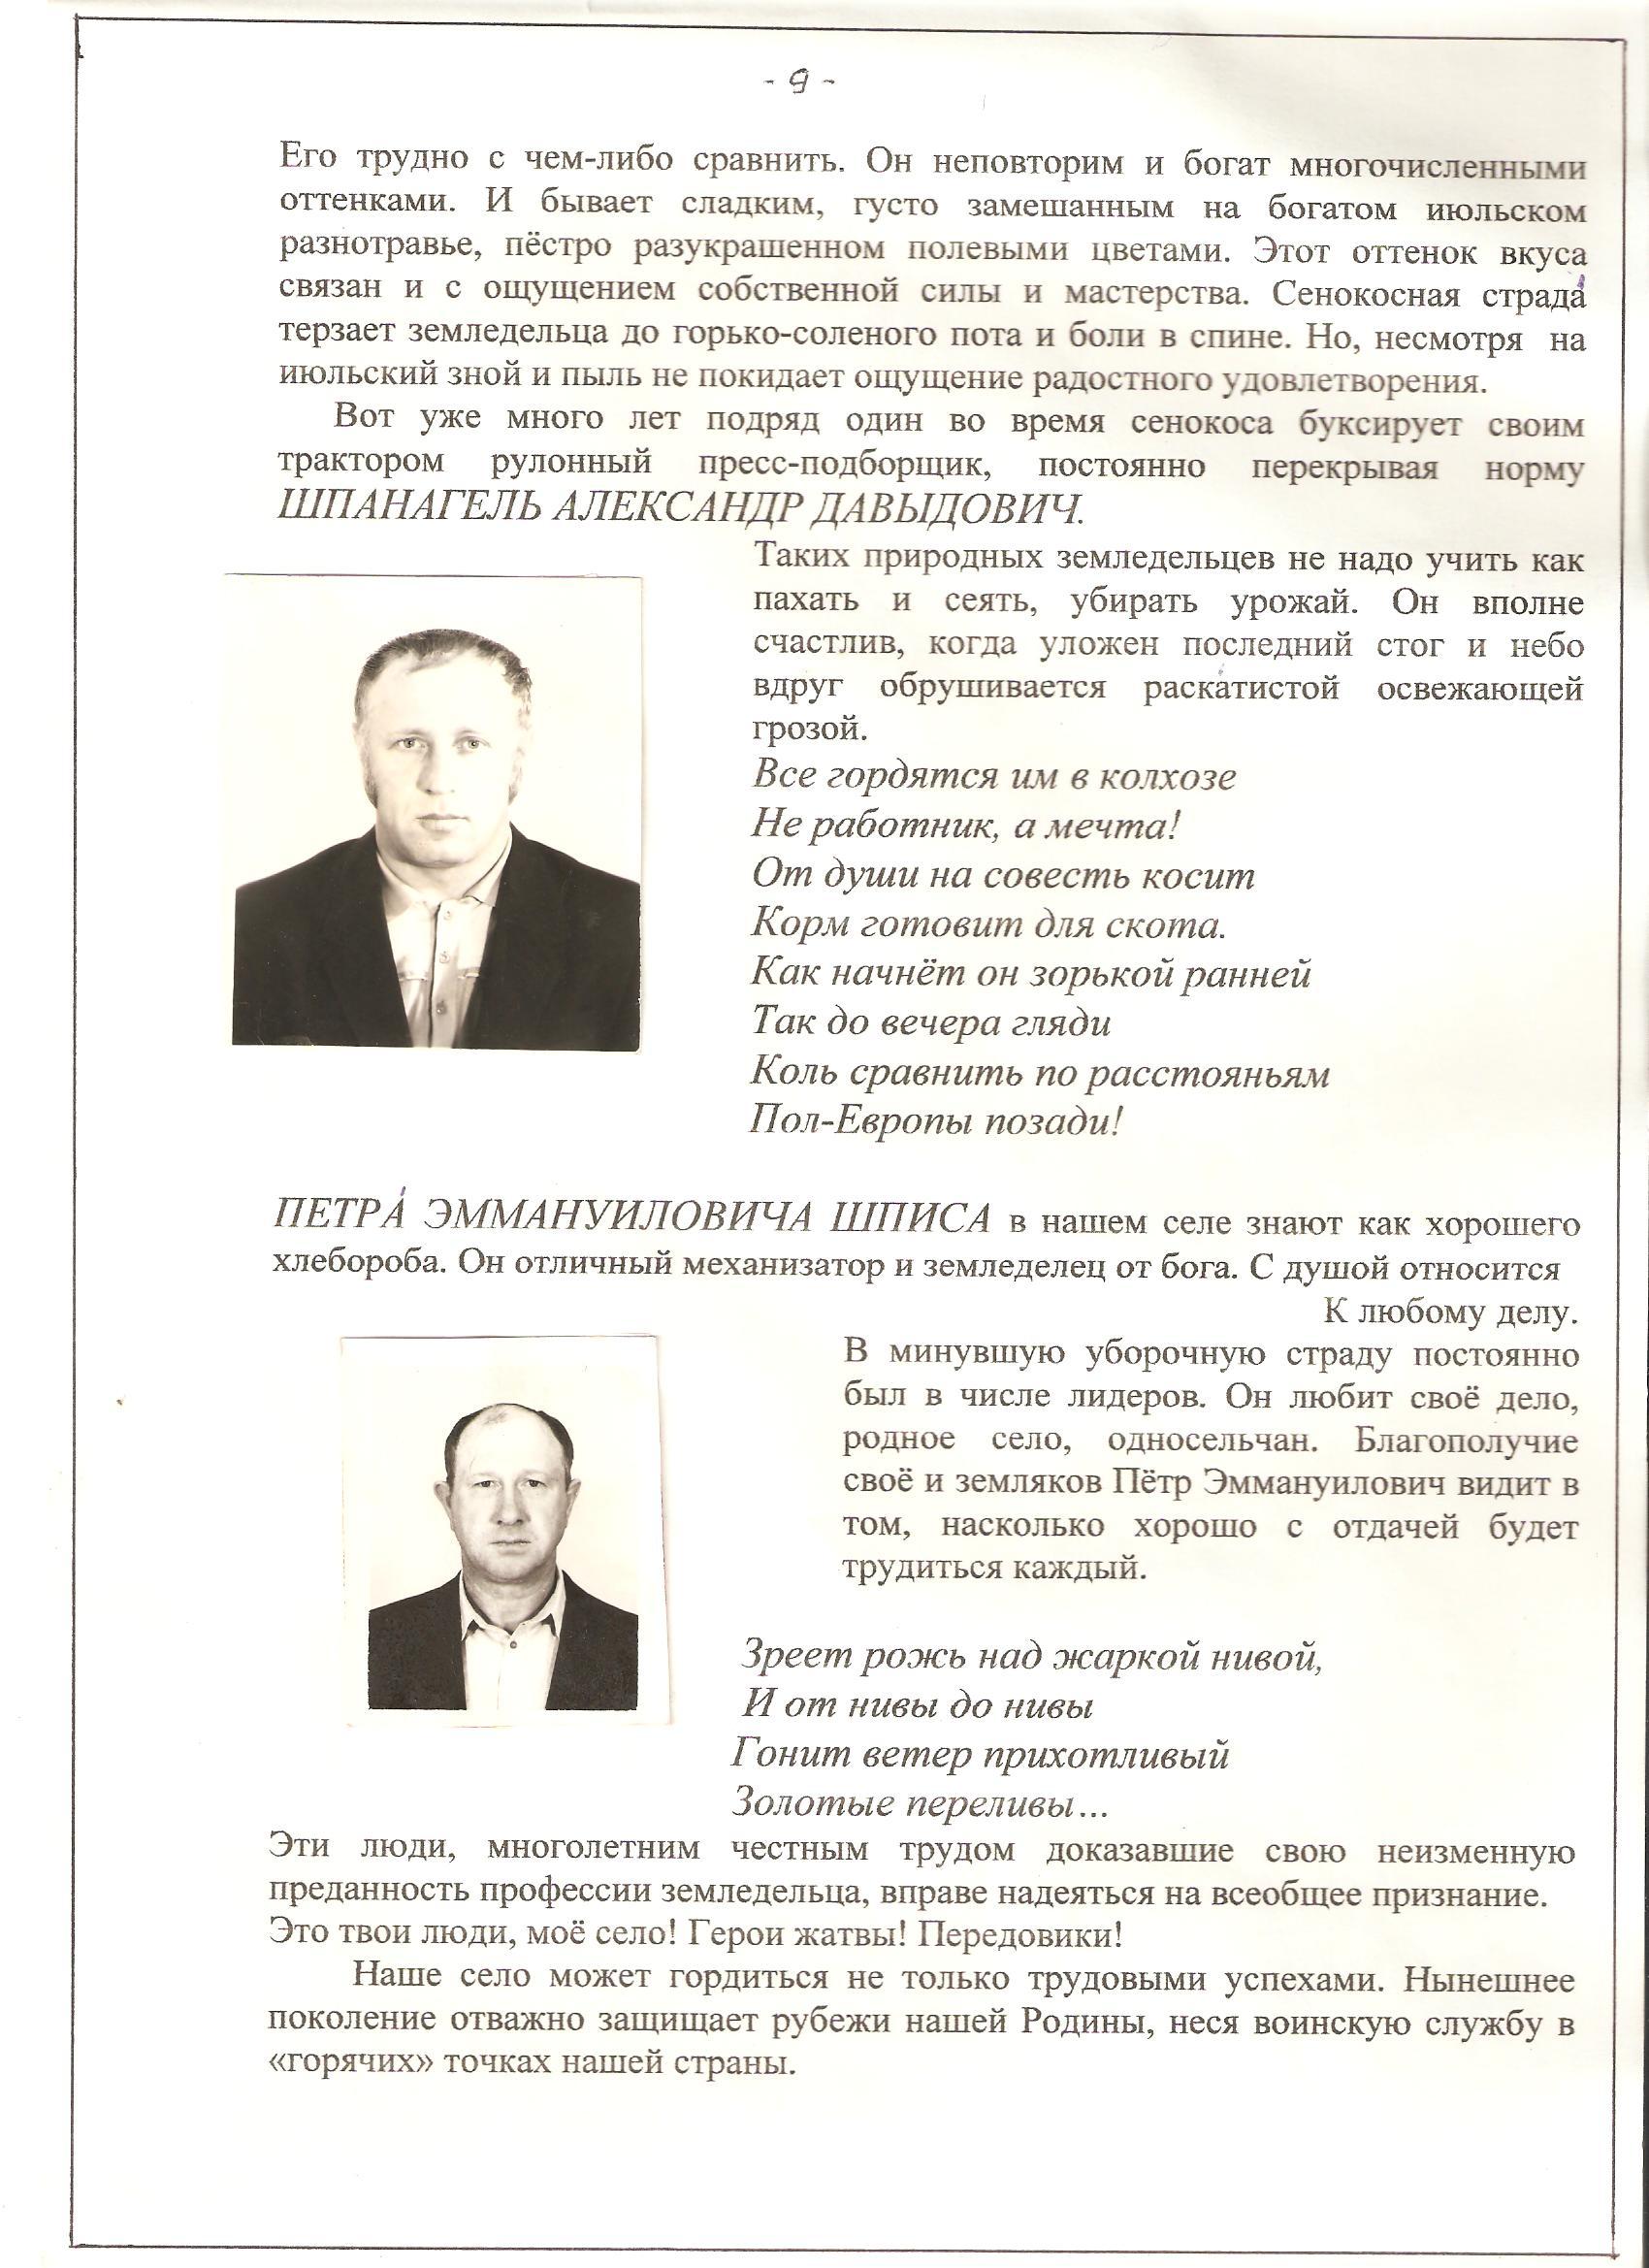 C:\Documents and Settings\USER\Рабочий стол\село1.jpg